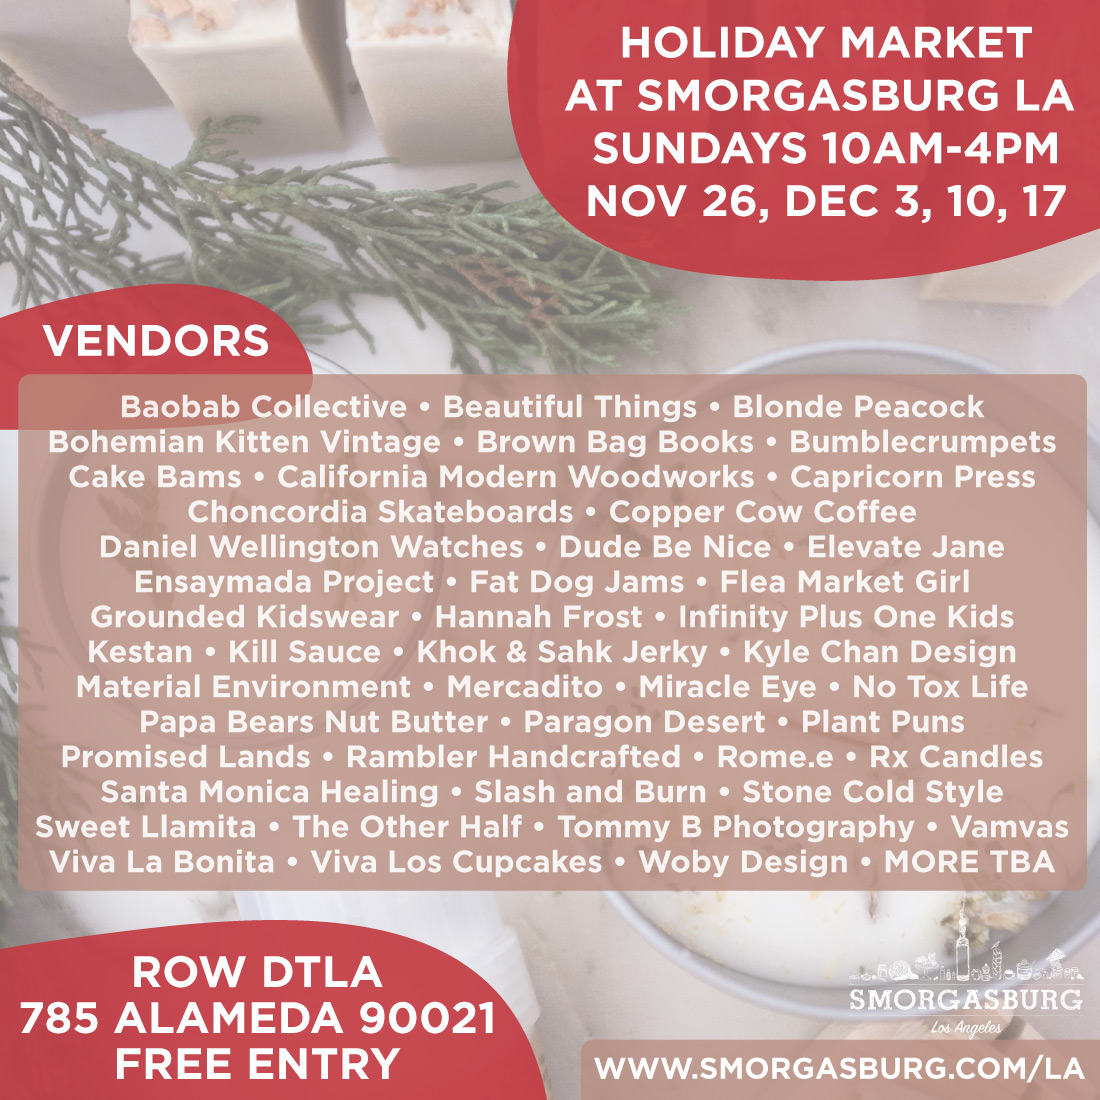 Smorgasburg-LA-Holiday-Market-Flyer.jpg